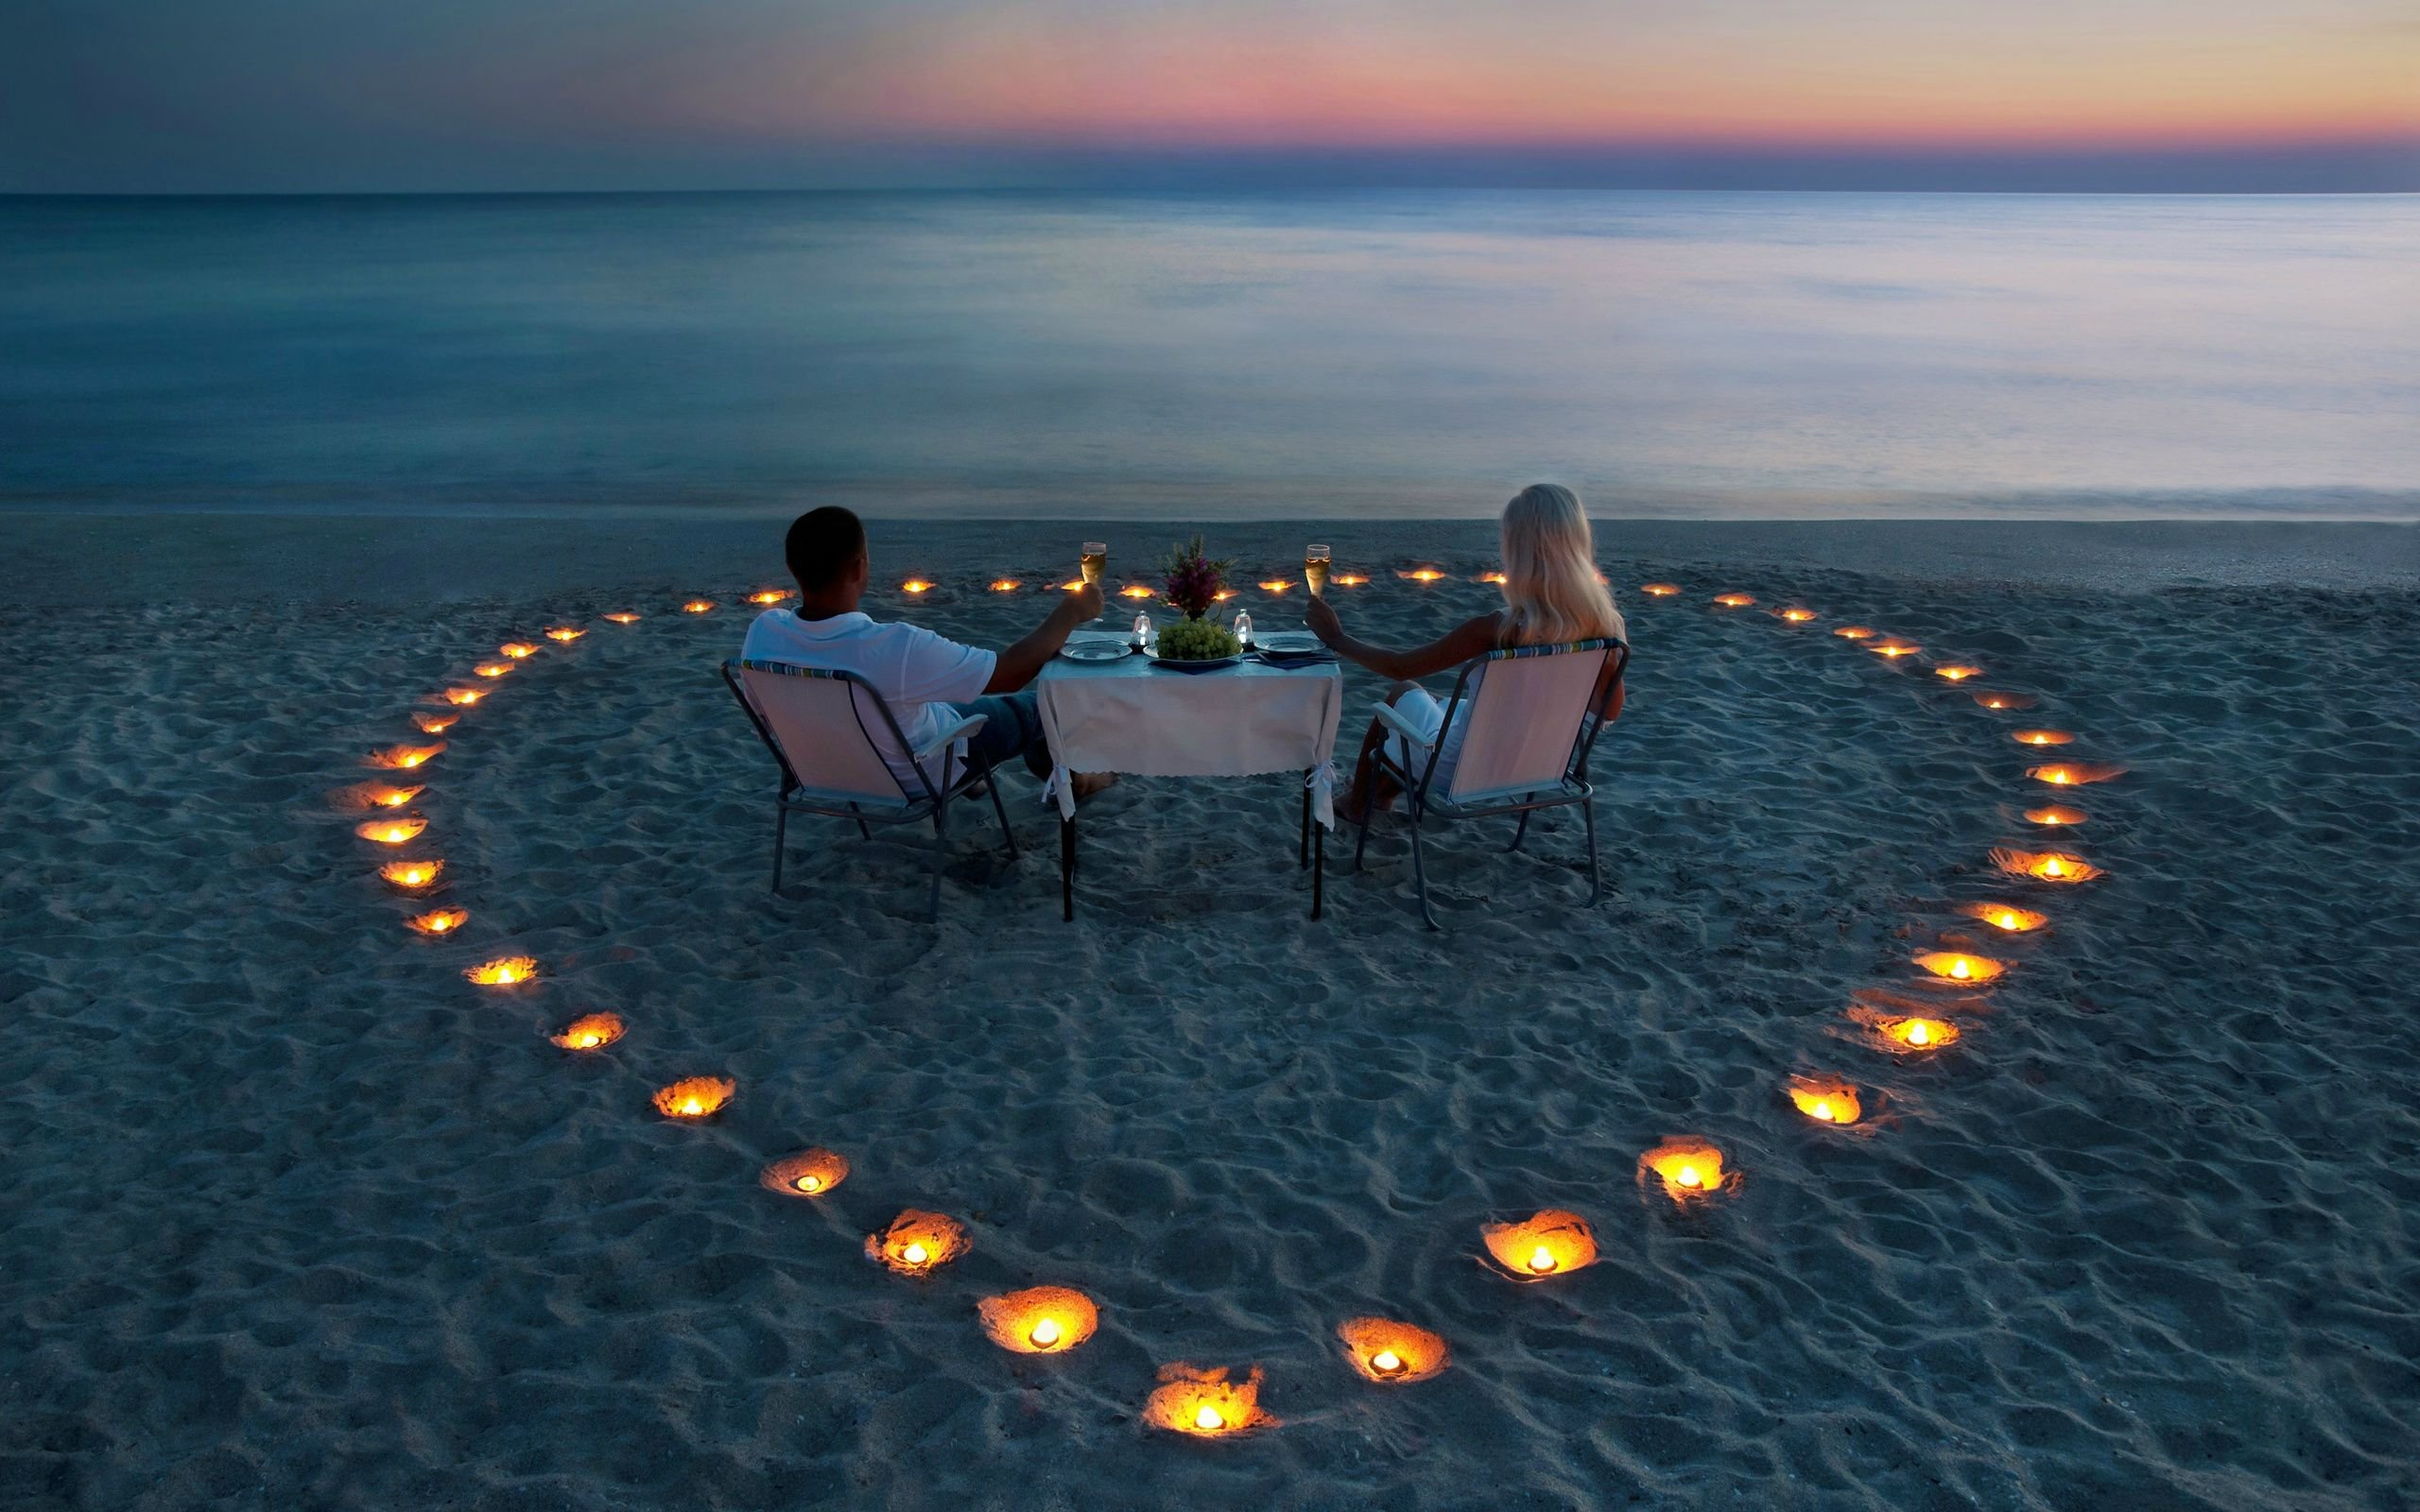 Island Romantic Good Evening Hd Wallpaper